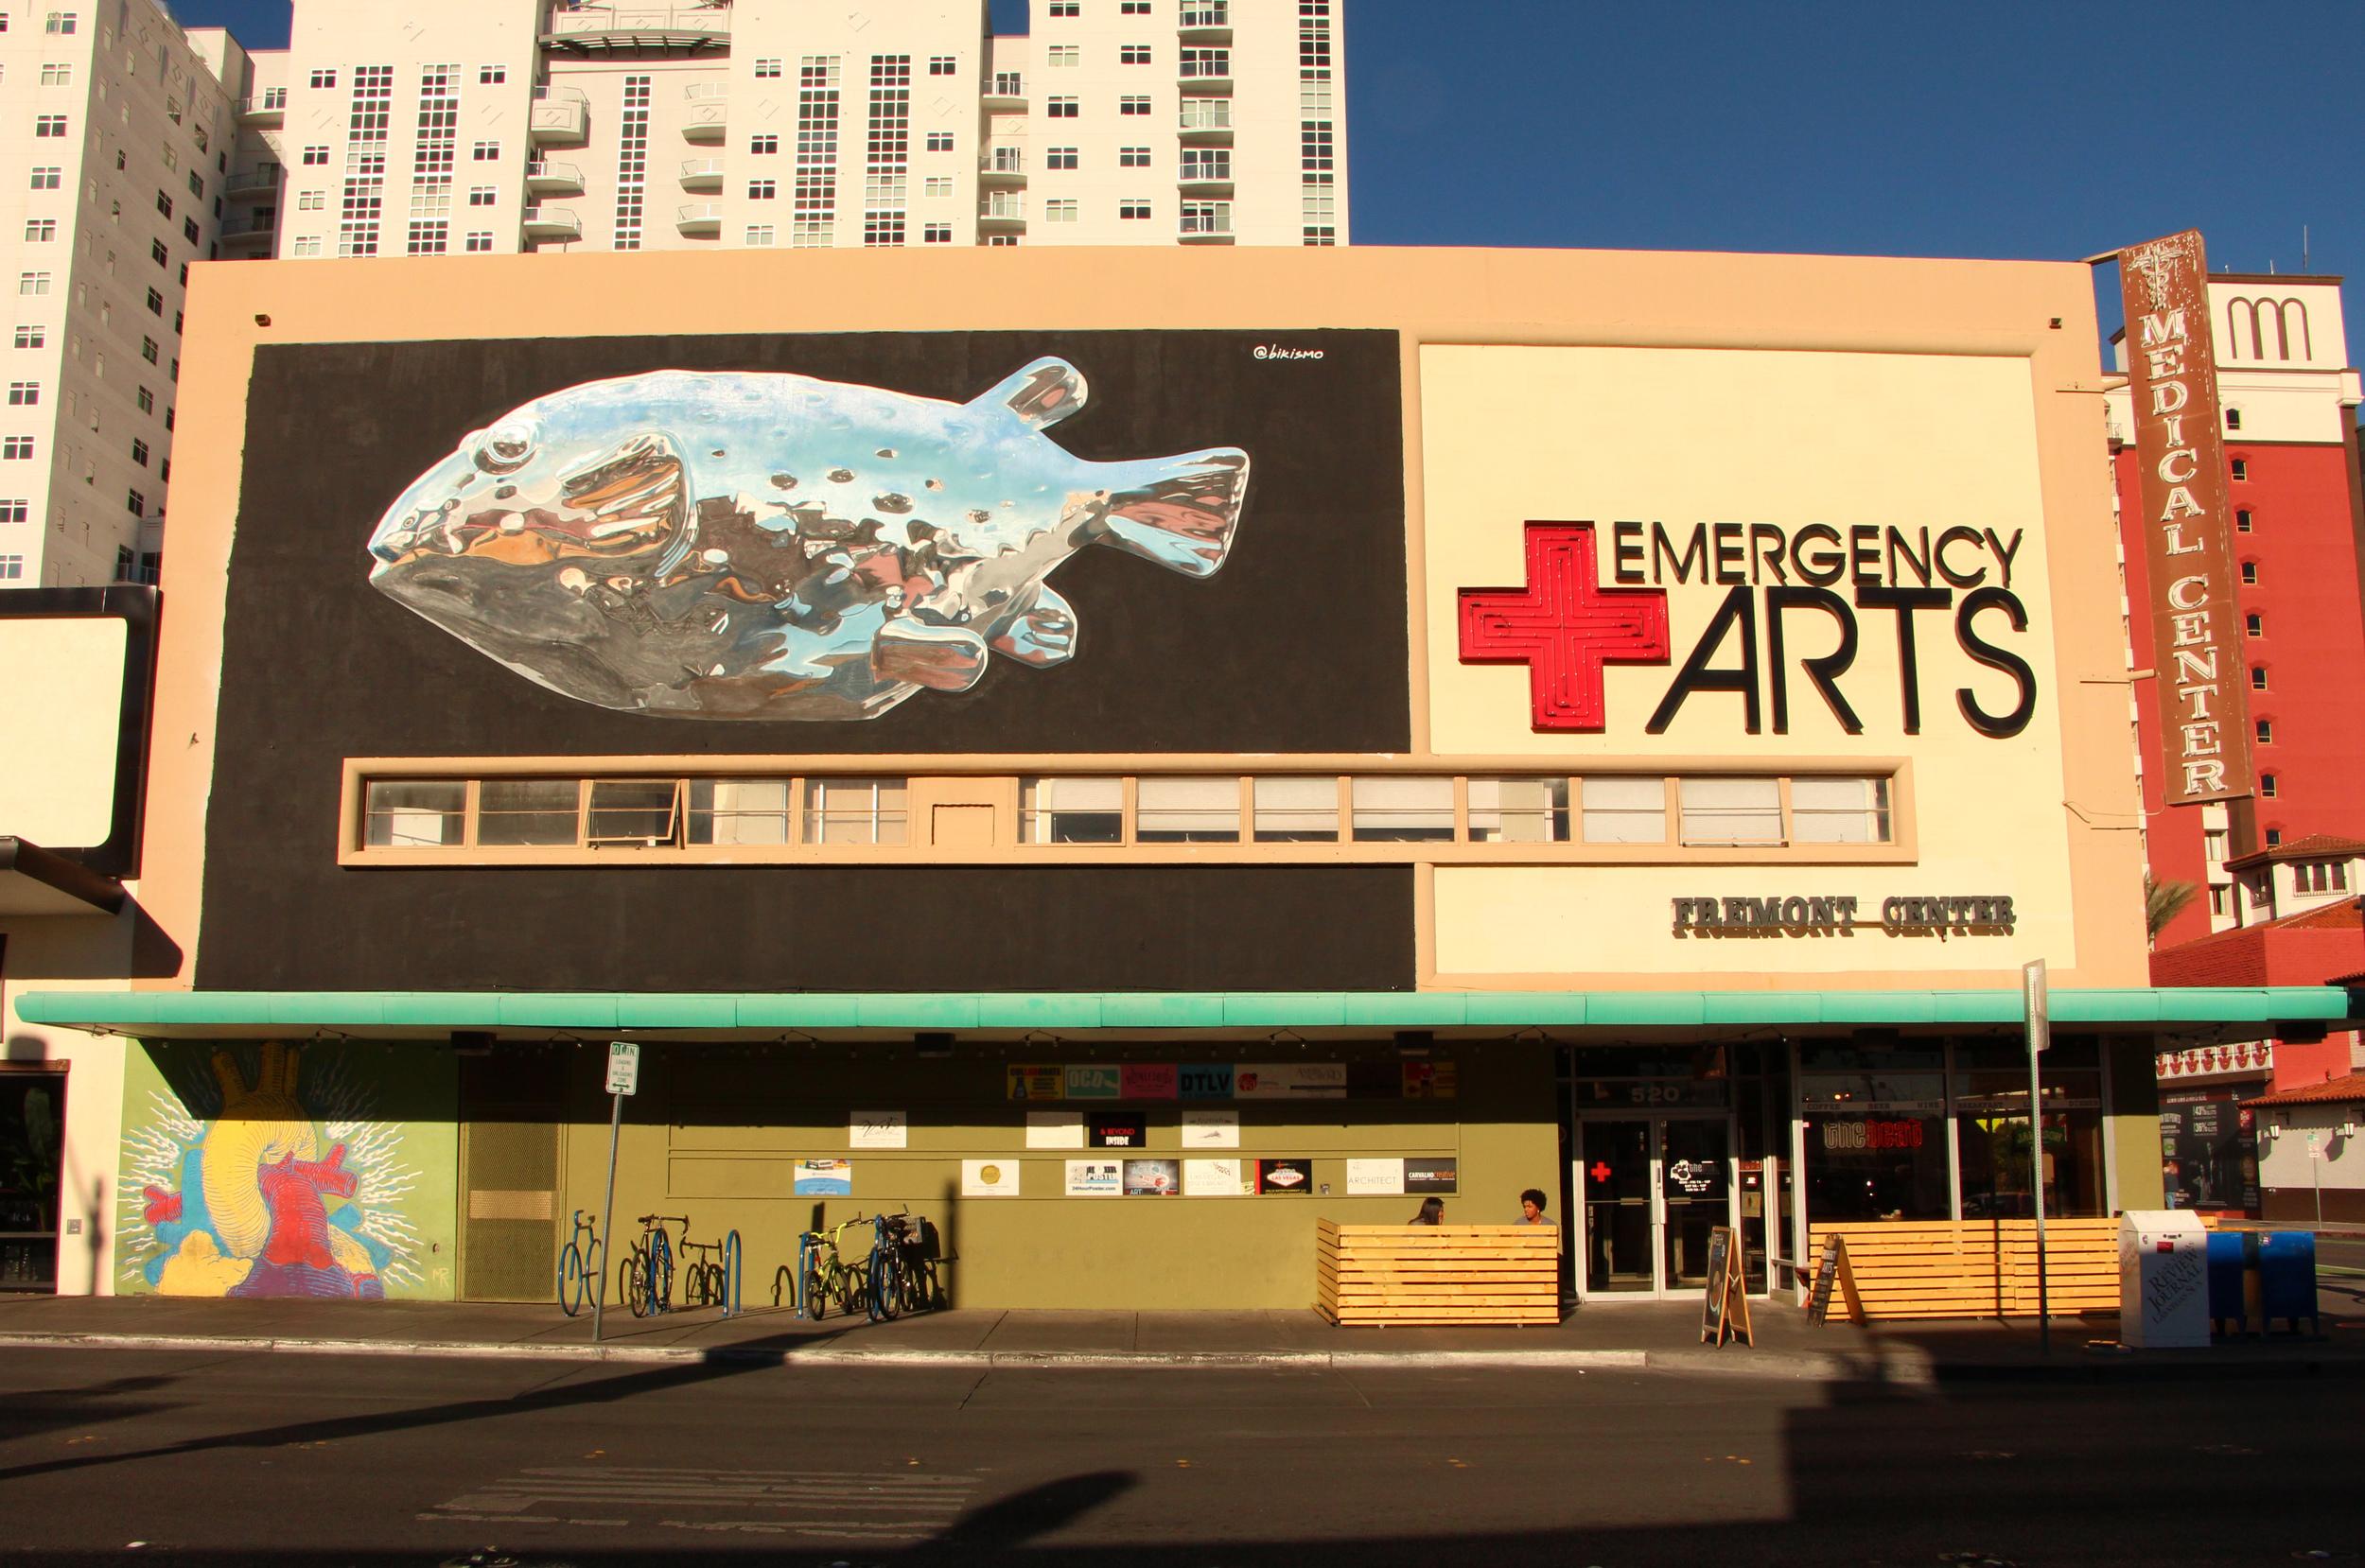 Emergency Arts